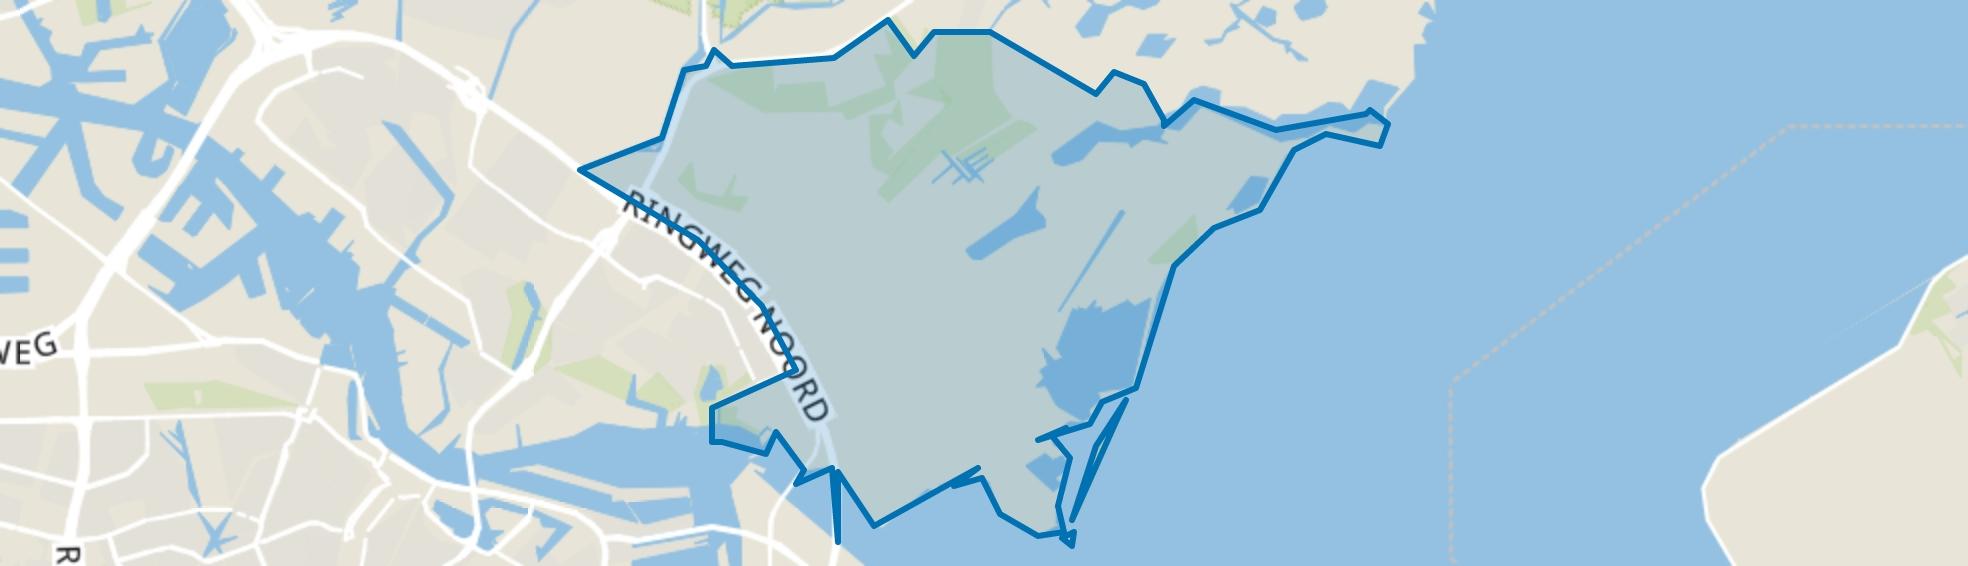 Waterland, Amsterdam map